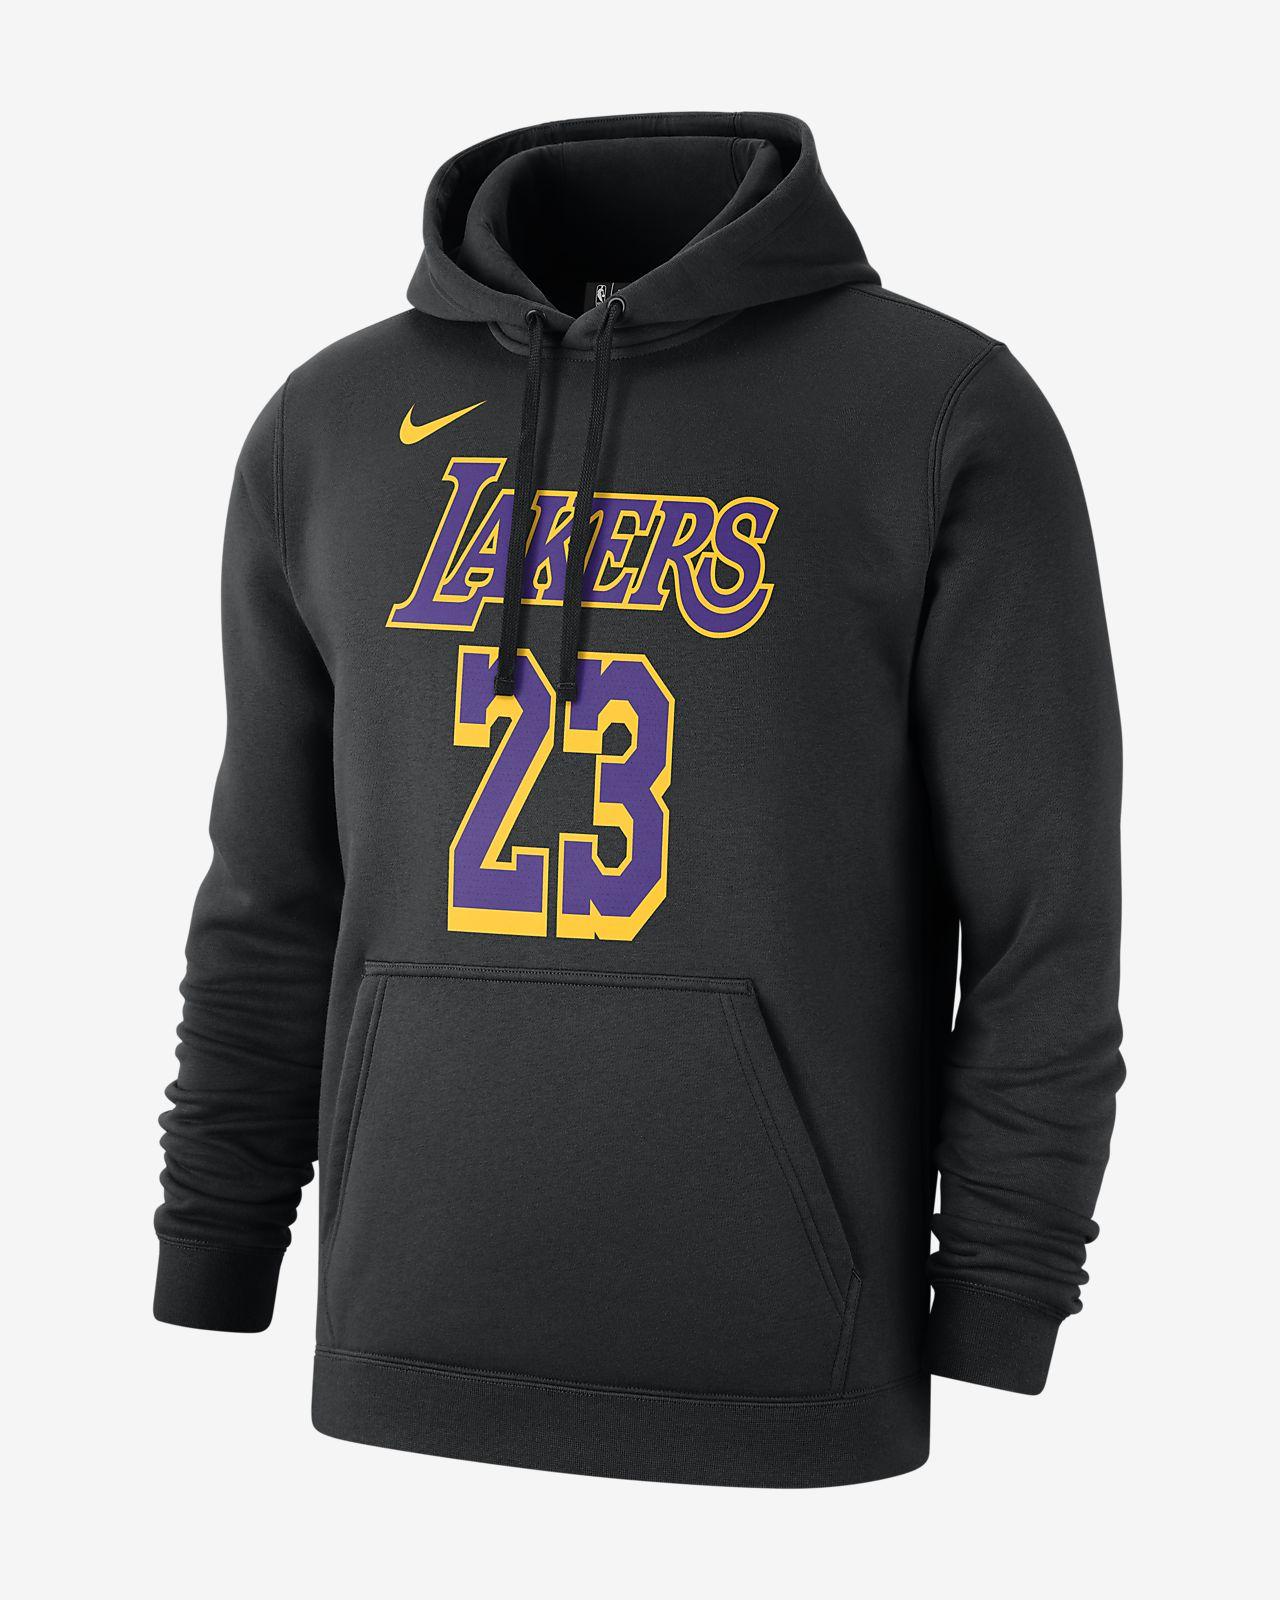 Pánská mikina NBA LeBron James Los Angeles Lakers Nike s kapucí